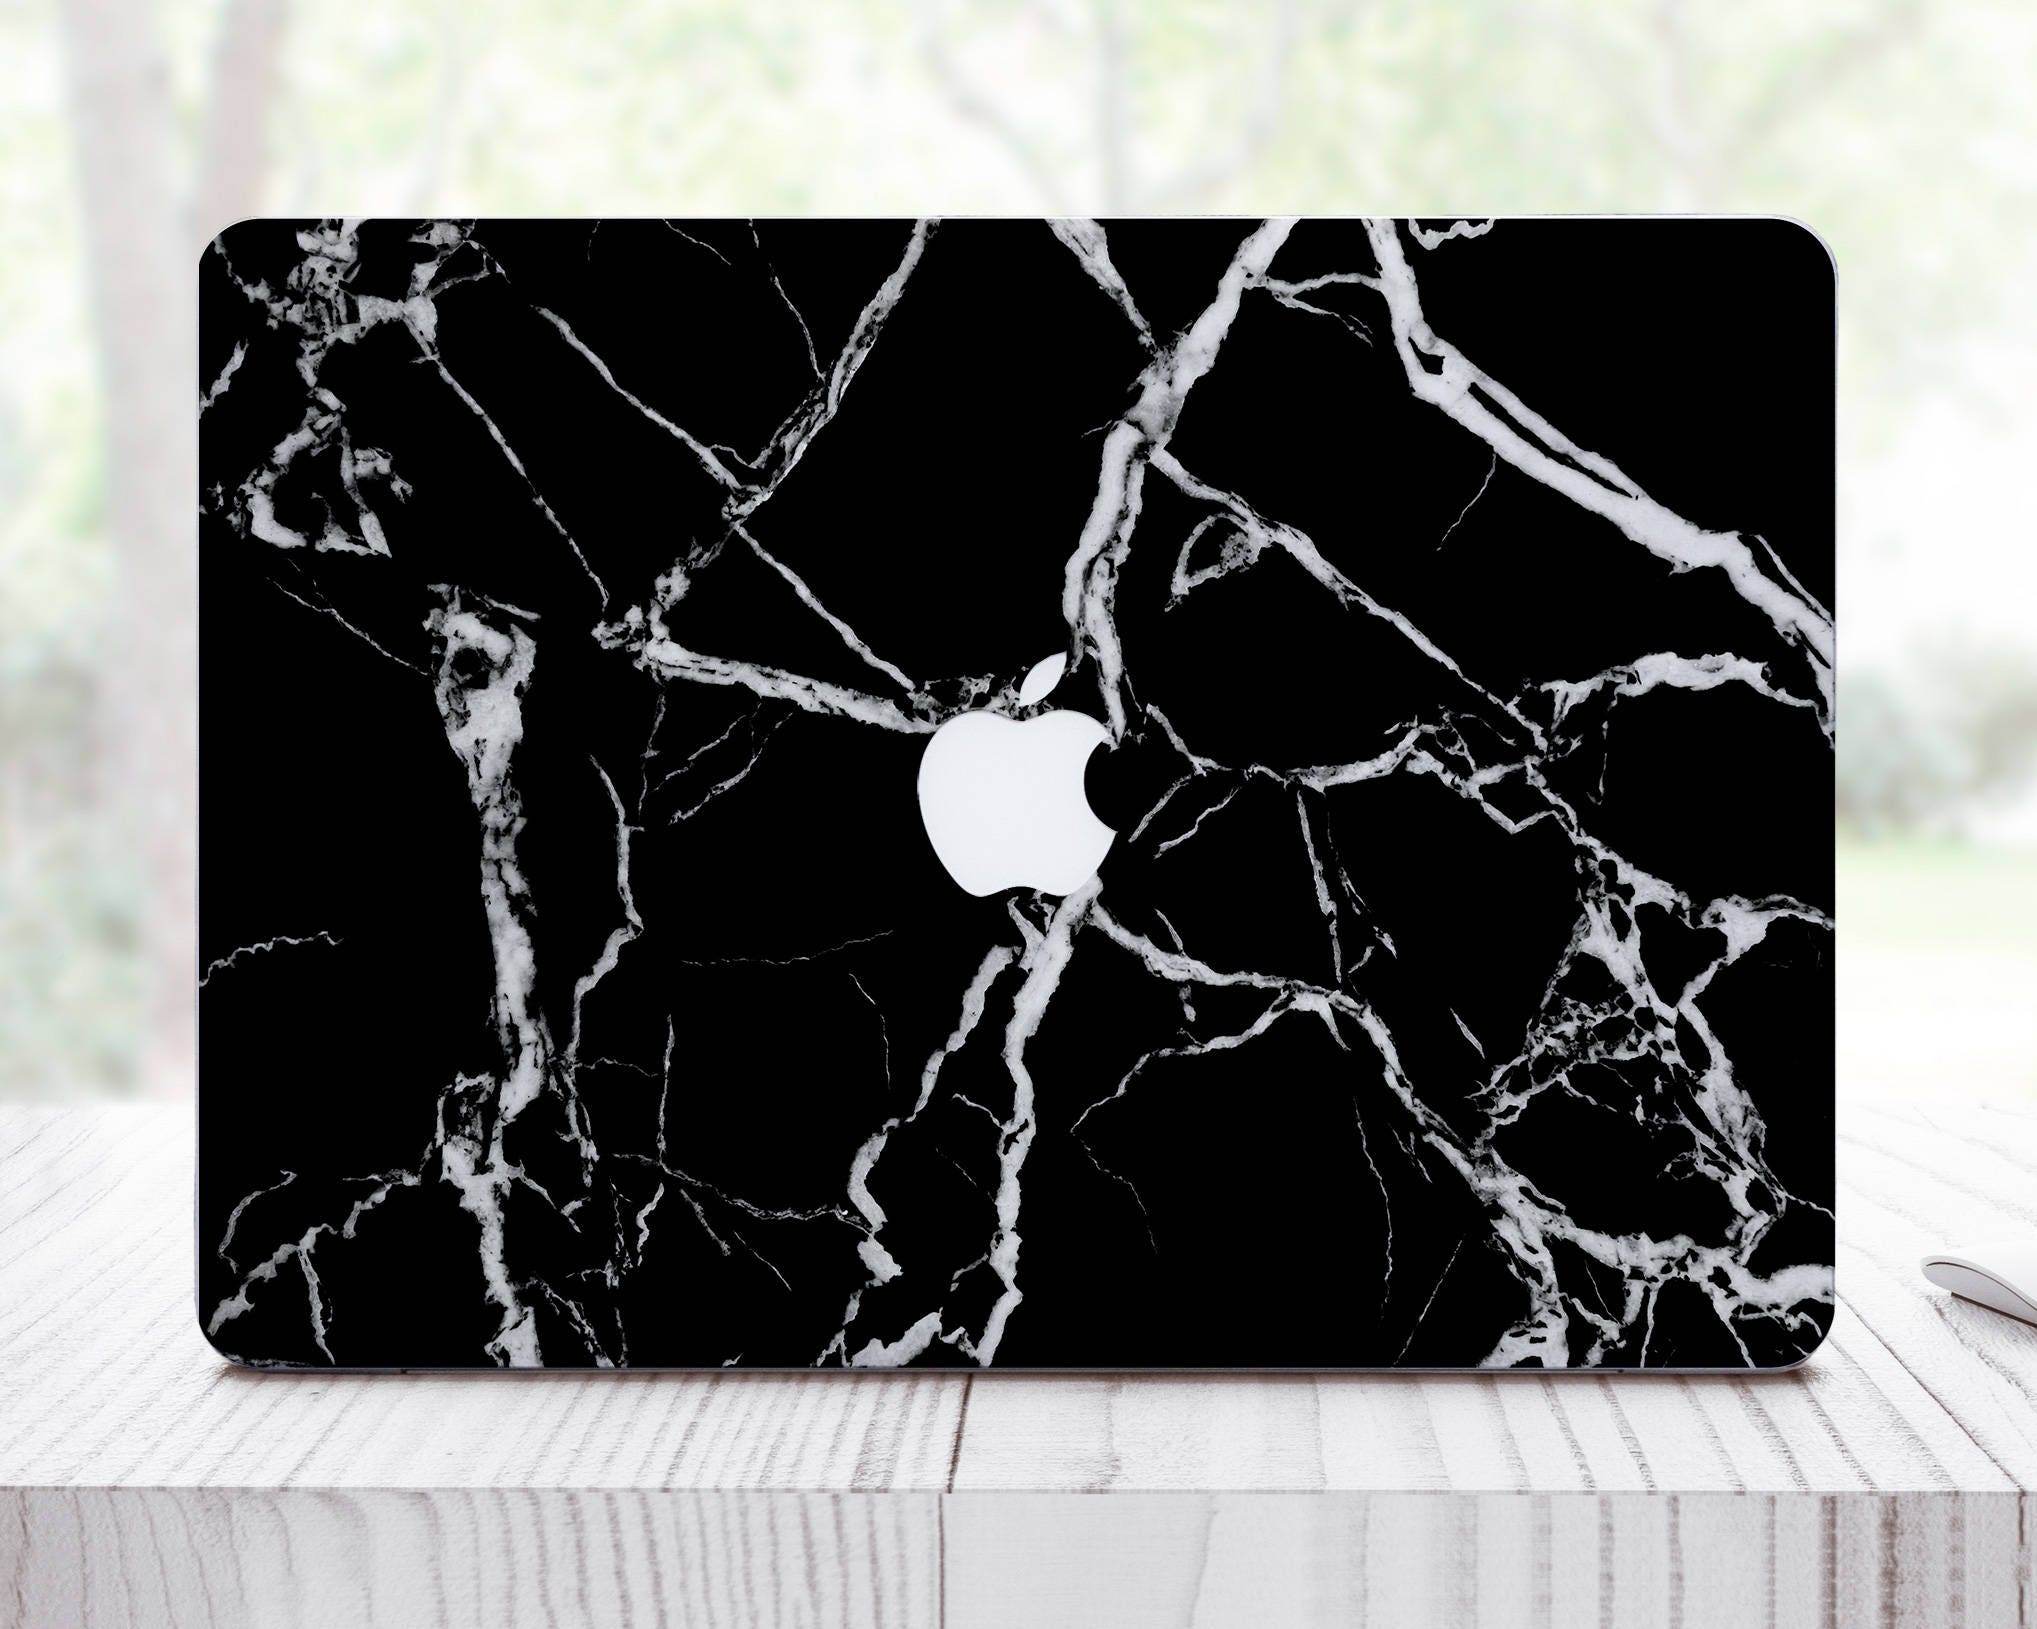 Black Marble MacBook Skin MacBook 12 inch Skin MacBook Pro 13 MacBook  Air Skin 11 Air MacBook Air 13 MacBook Pro Retina 15 SKin ES0001